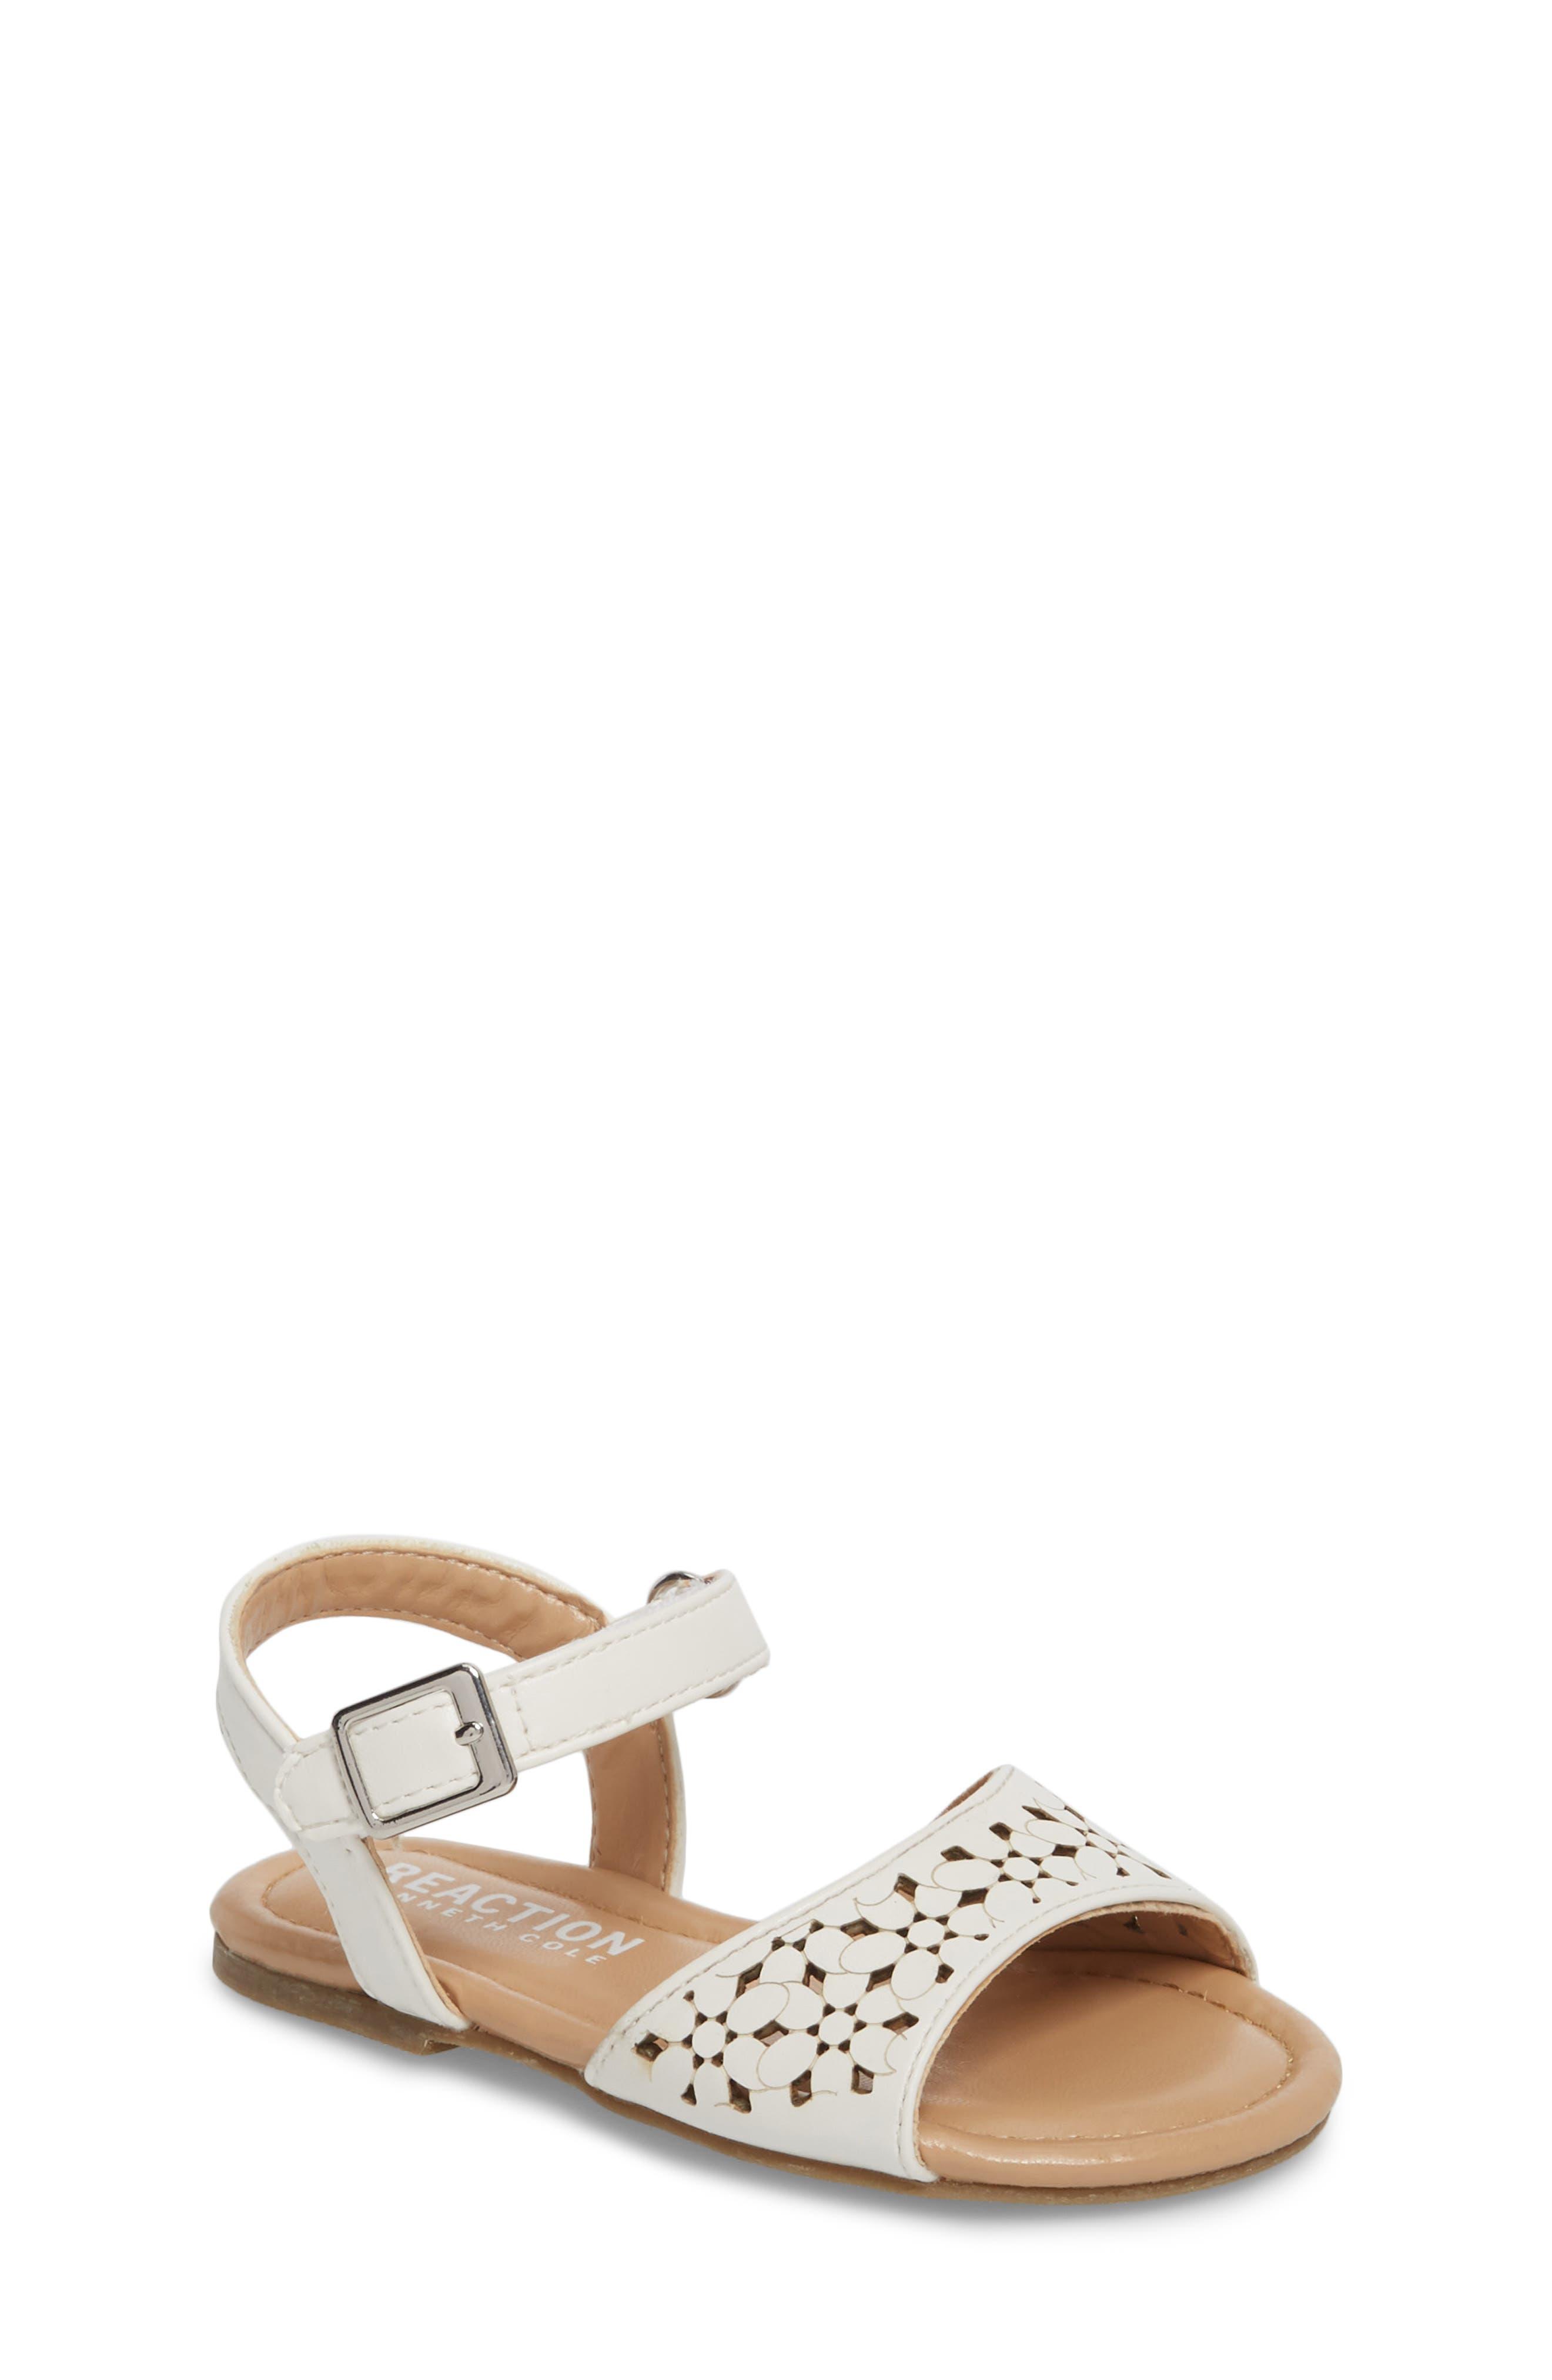 Kiera Perforated Sandal,                             Main thumbnail 1, color,                             100